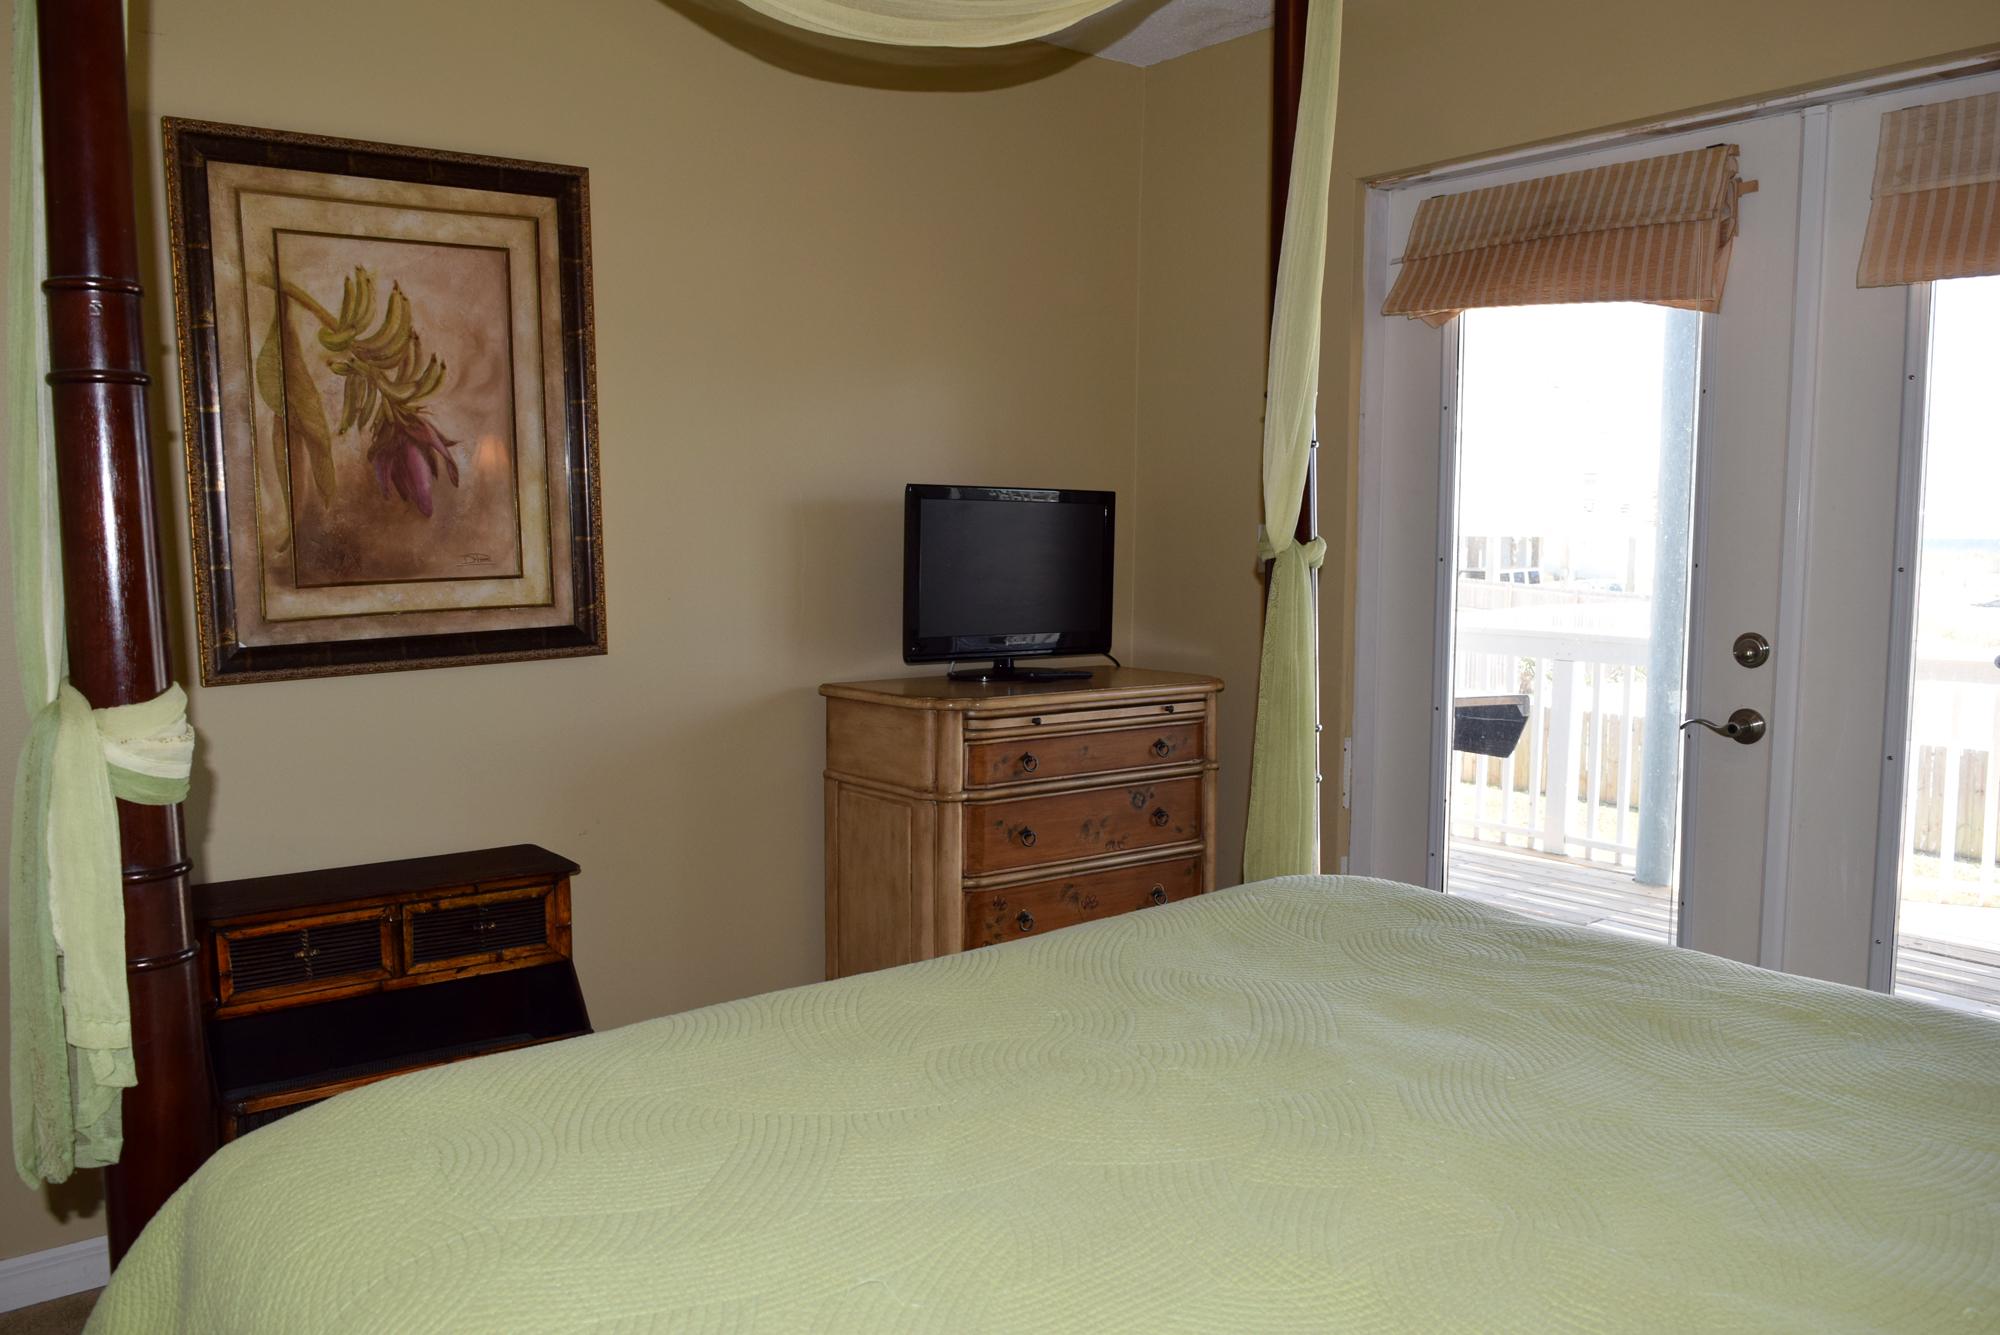 Maldonado 1010 House/Cottage rental in Pensacola Beach House Rentals in Pensacola Beach Florida - #20